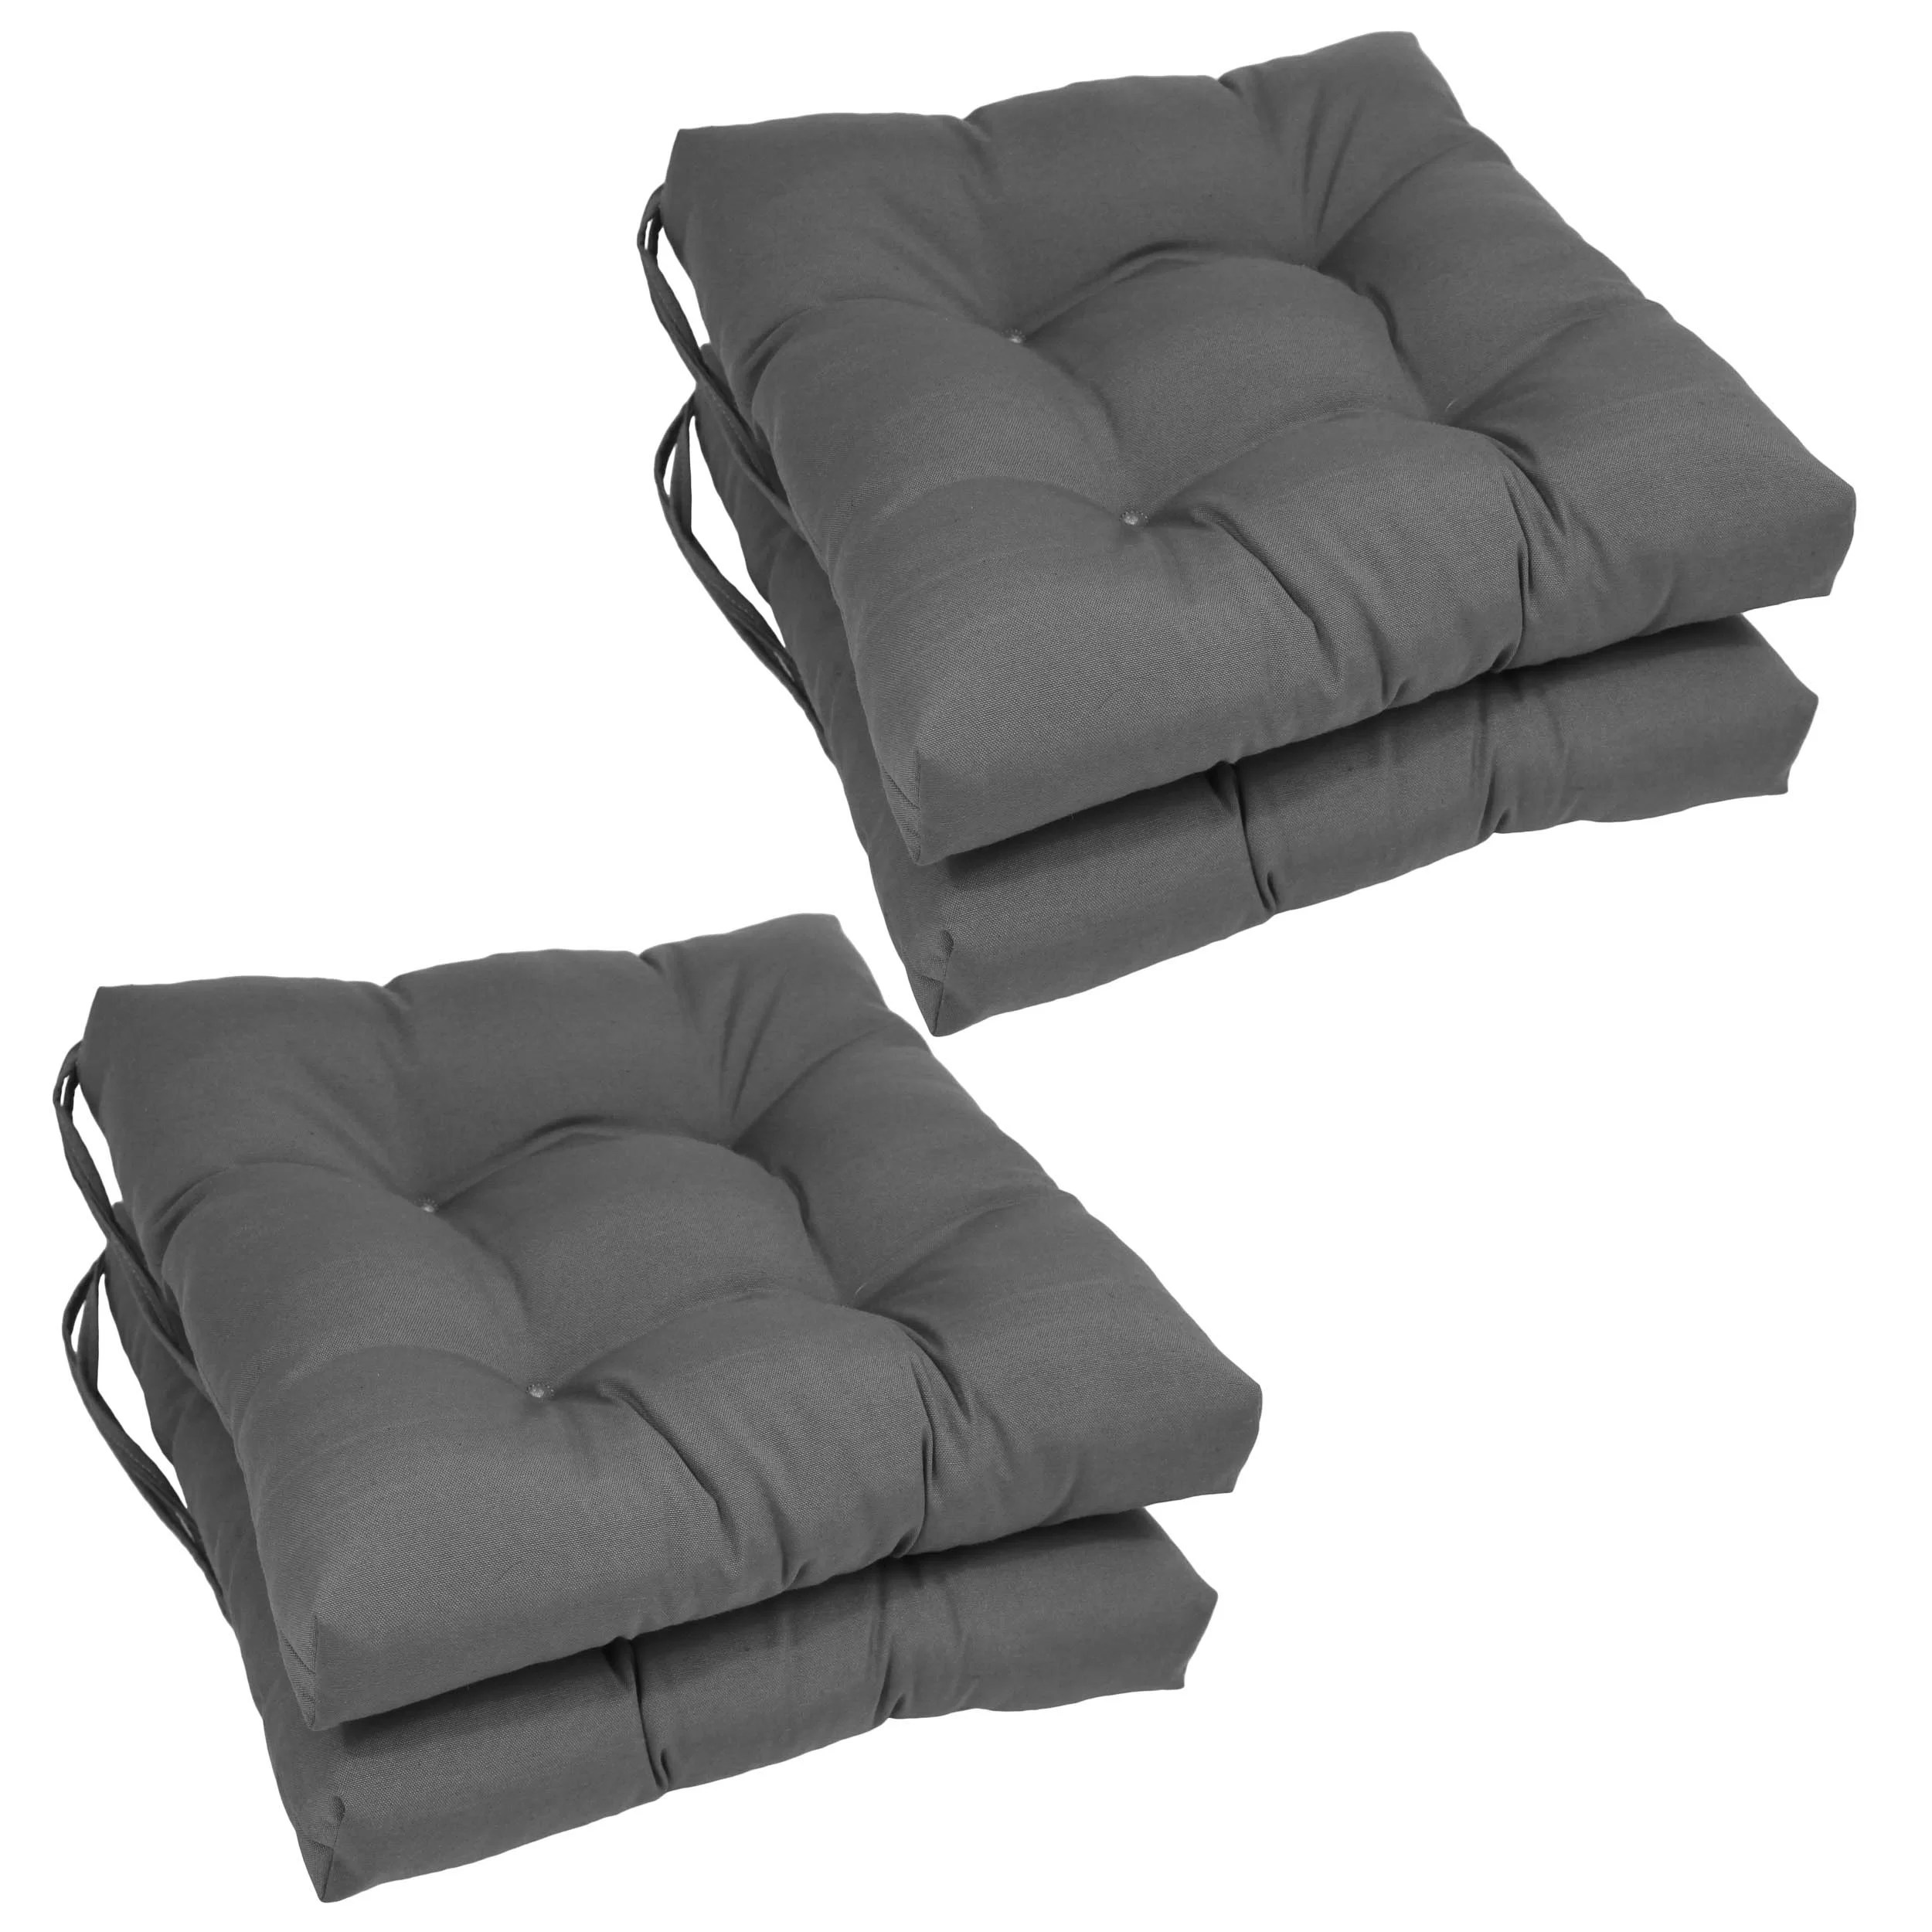 wayfair grey chair seat cushions